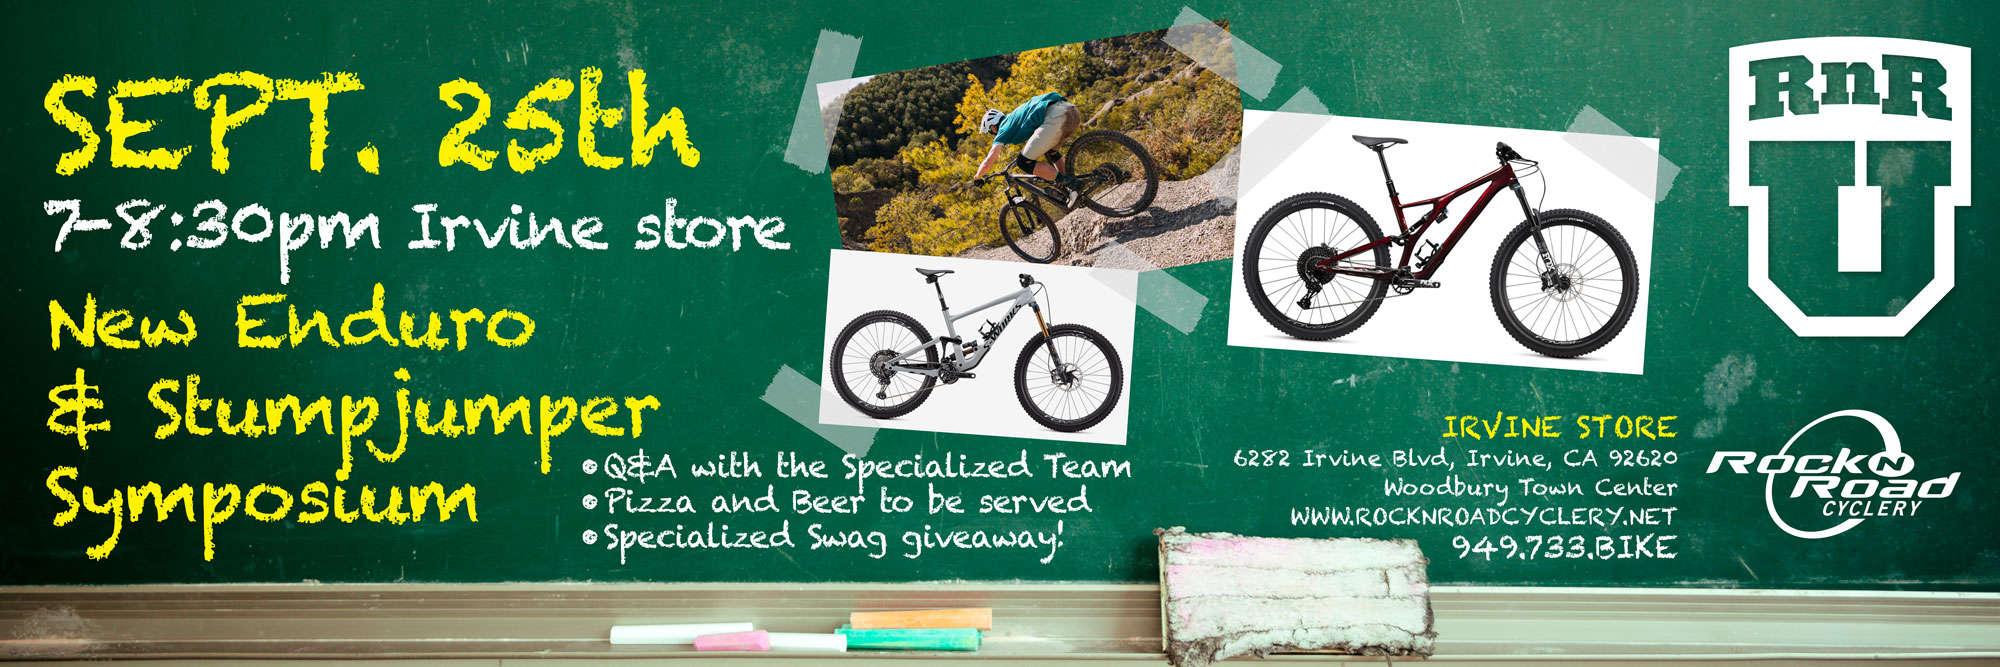 Rock N' Road Cyclery - Orange County's Best Bike Shop